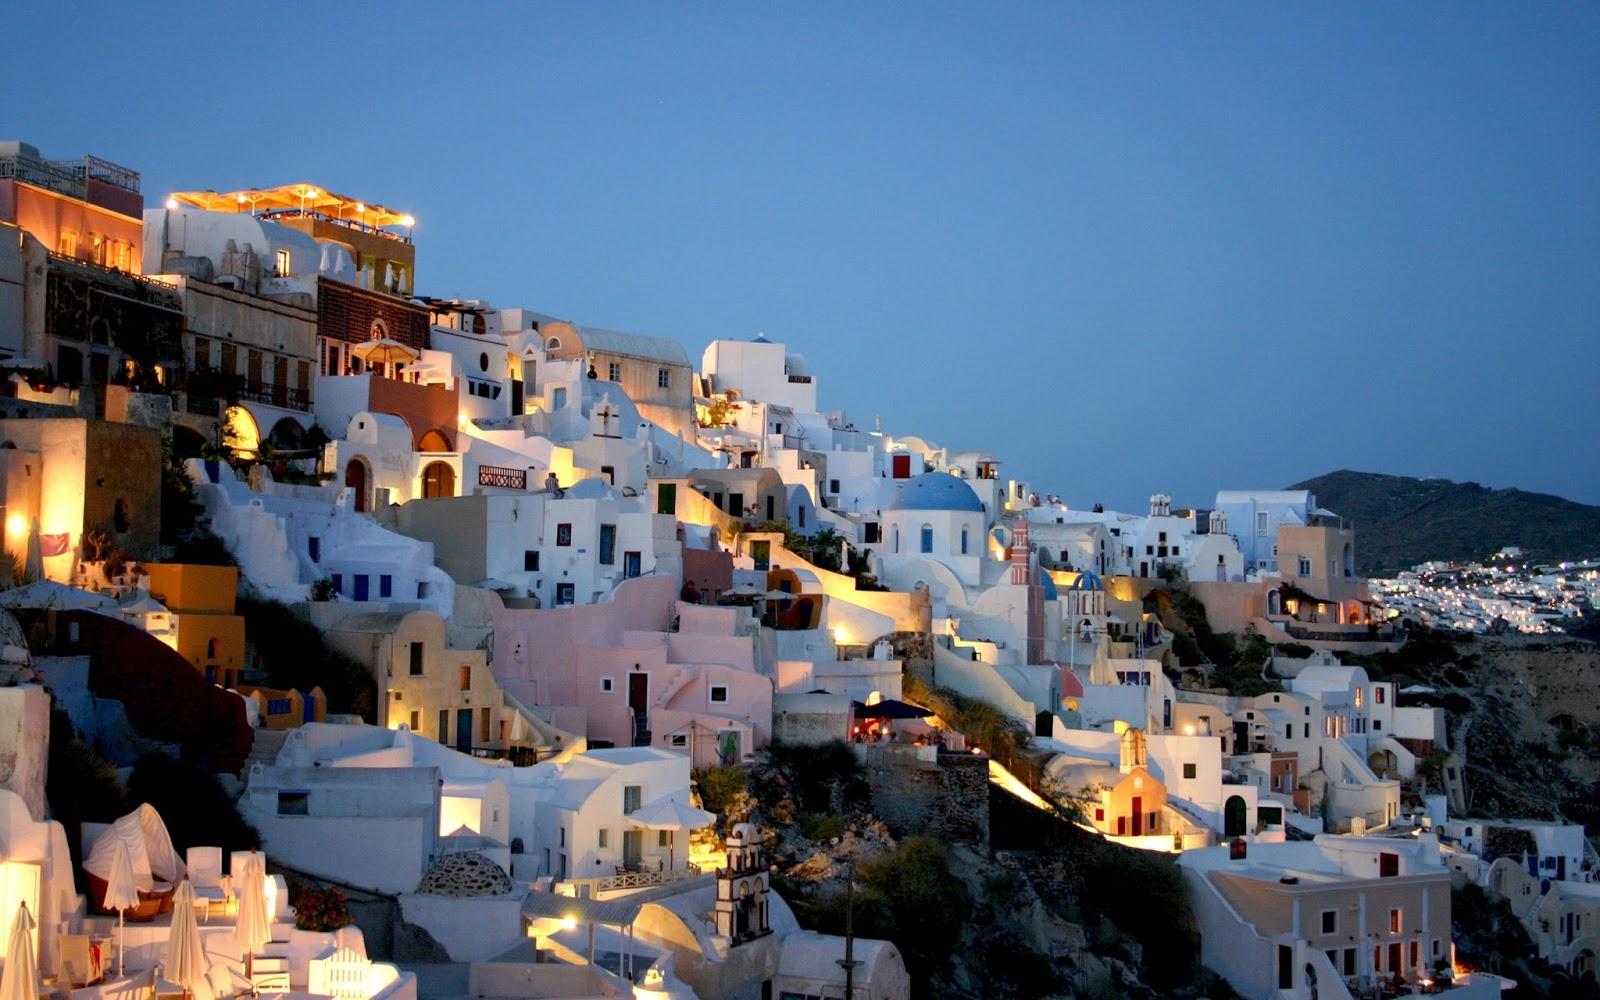 http://4.bp.blogspot.com/-WiSsR72u_6g/UTR8nCAv7zI/AAAAAAAARz8/CPZILXgHoV8/s1600/Santorini_greece_island_wallpaper_white-houses_hd_1.jpg